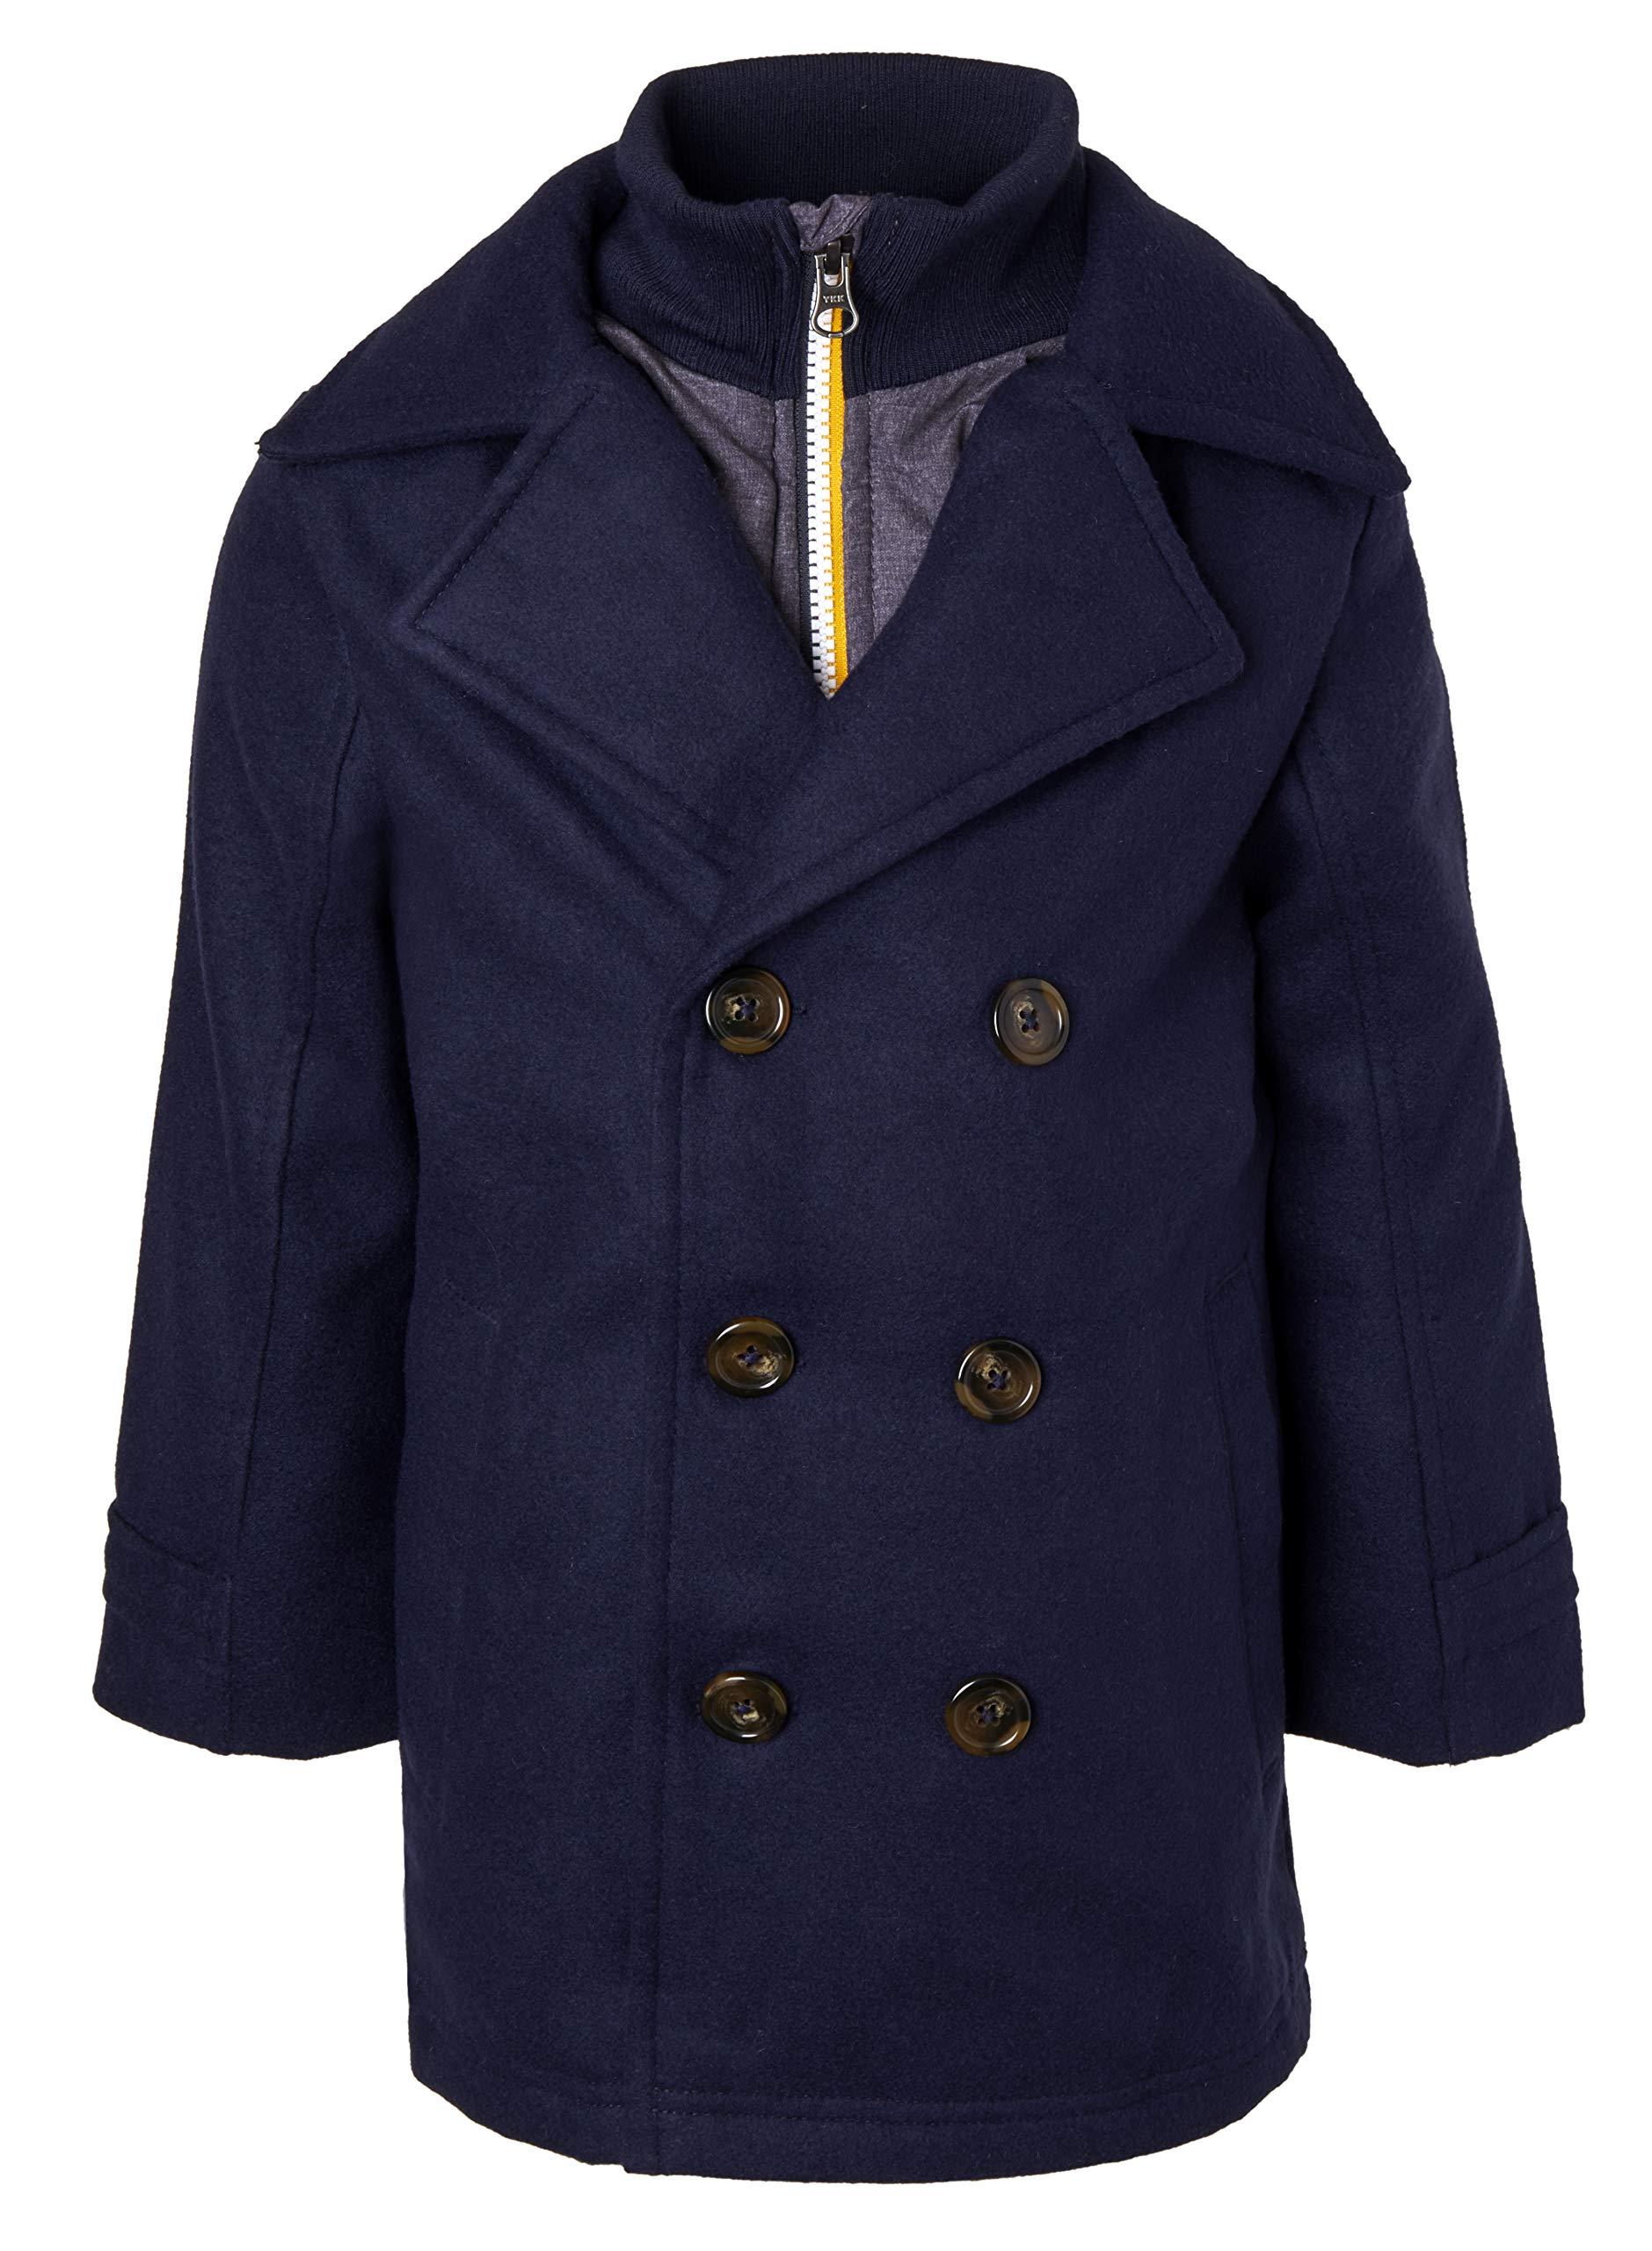 Sportoli Boys Classic Wool Look Lined Winter Vestee Dress Pea Coat Peacoat Jacket - Navy Vestee (Size 7)